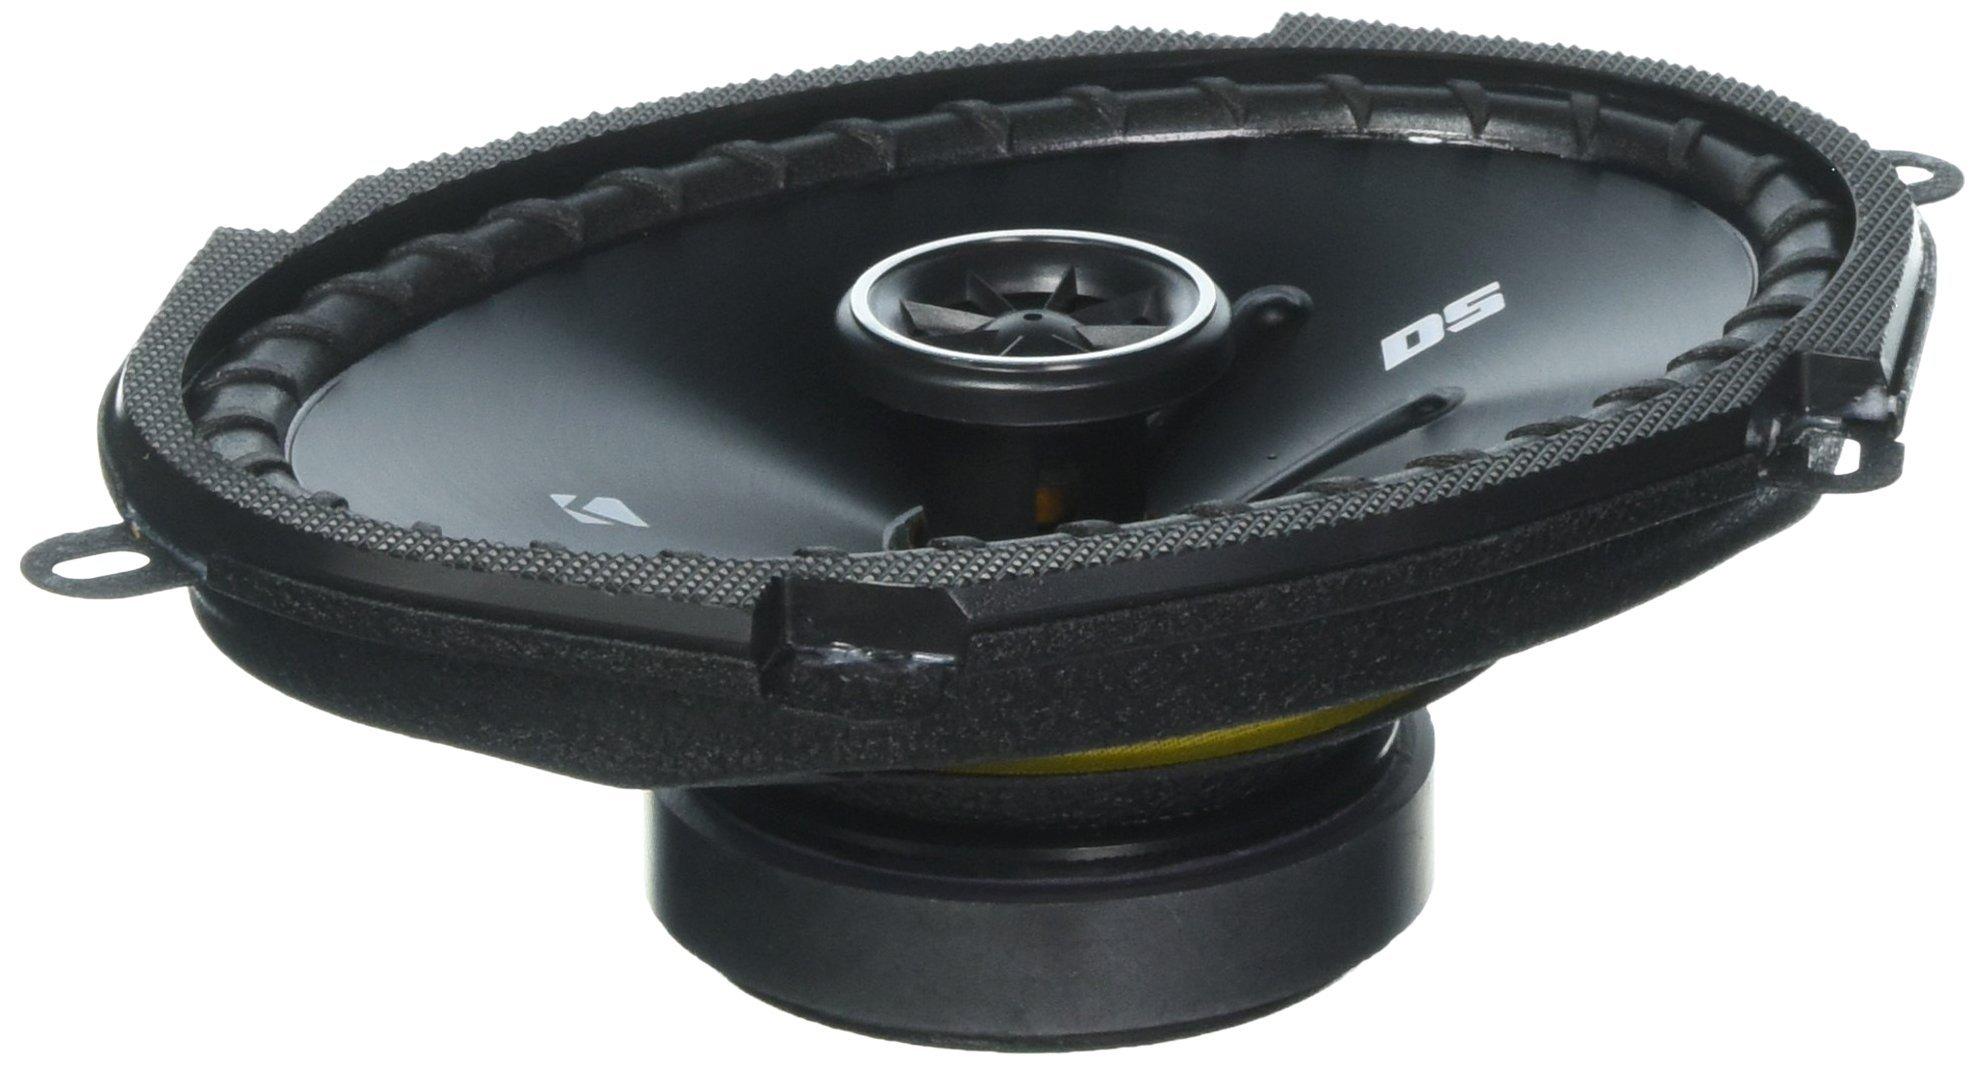 Kicker 43DSC6804 D-Series 6x8-Inch 200W Speakers Pair